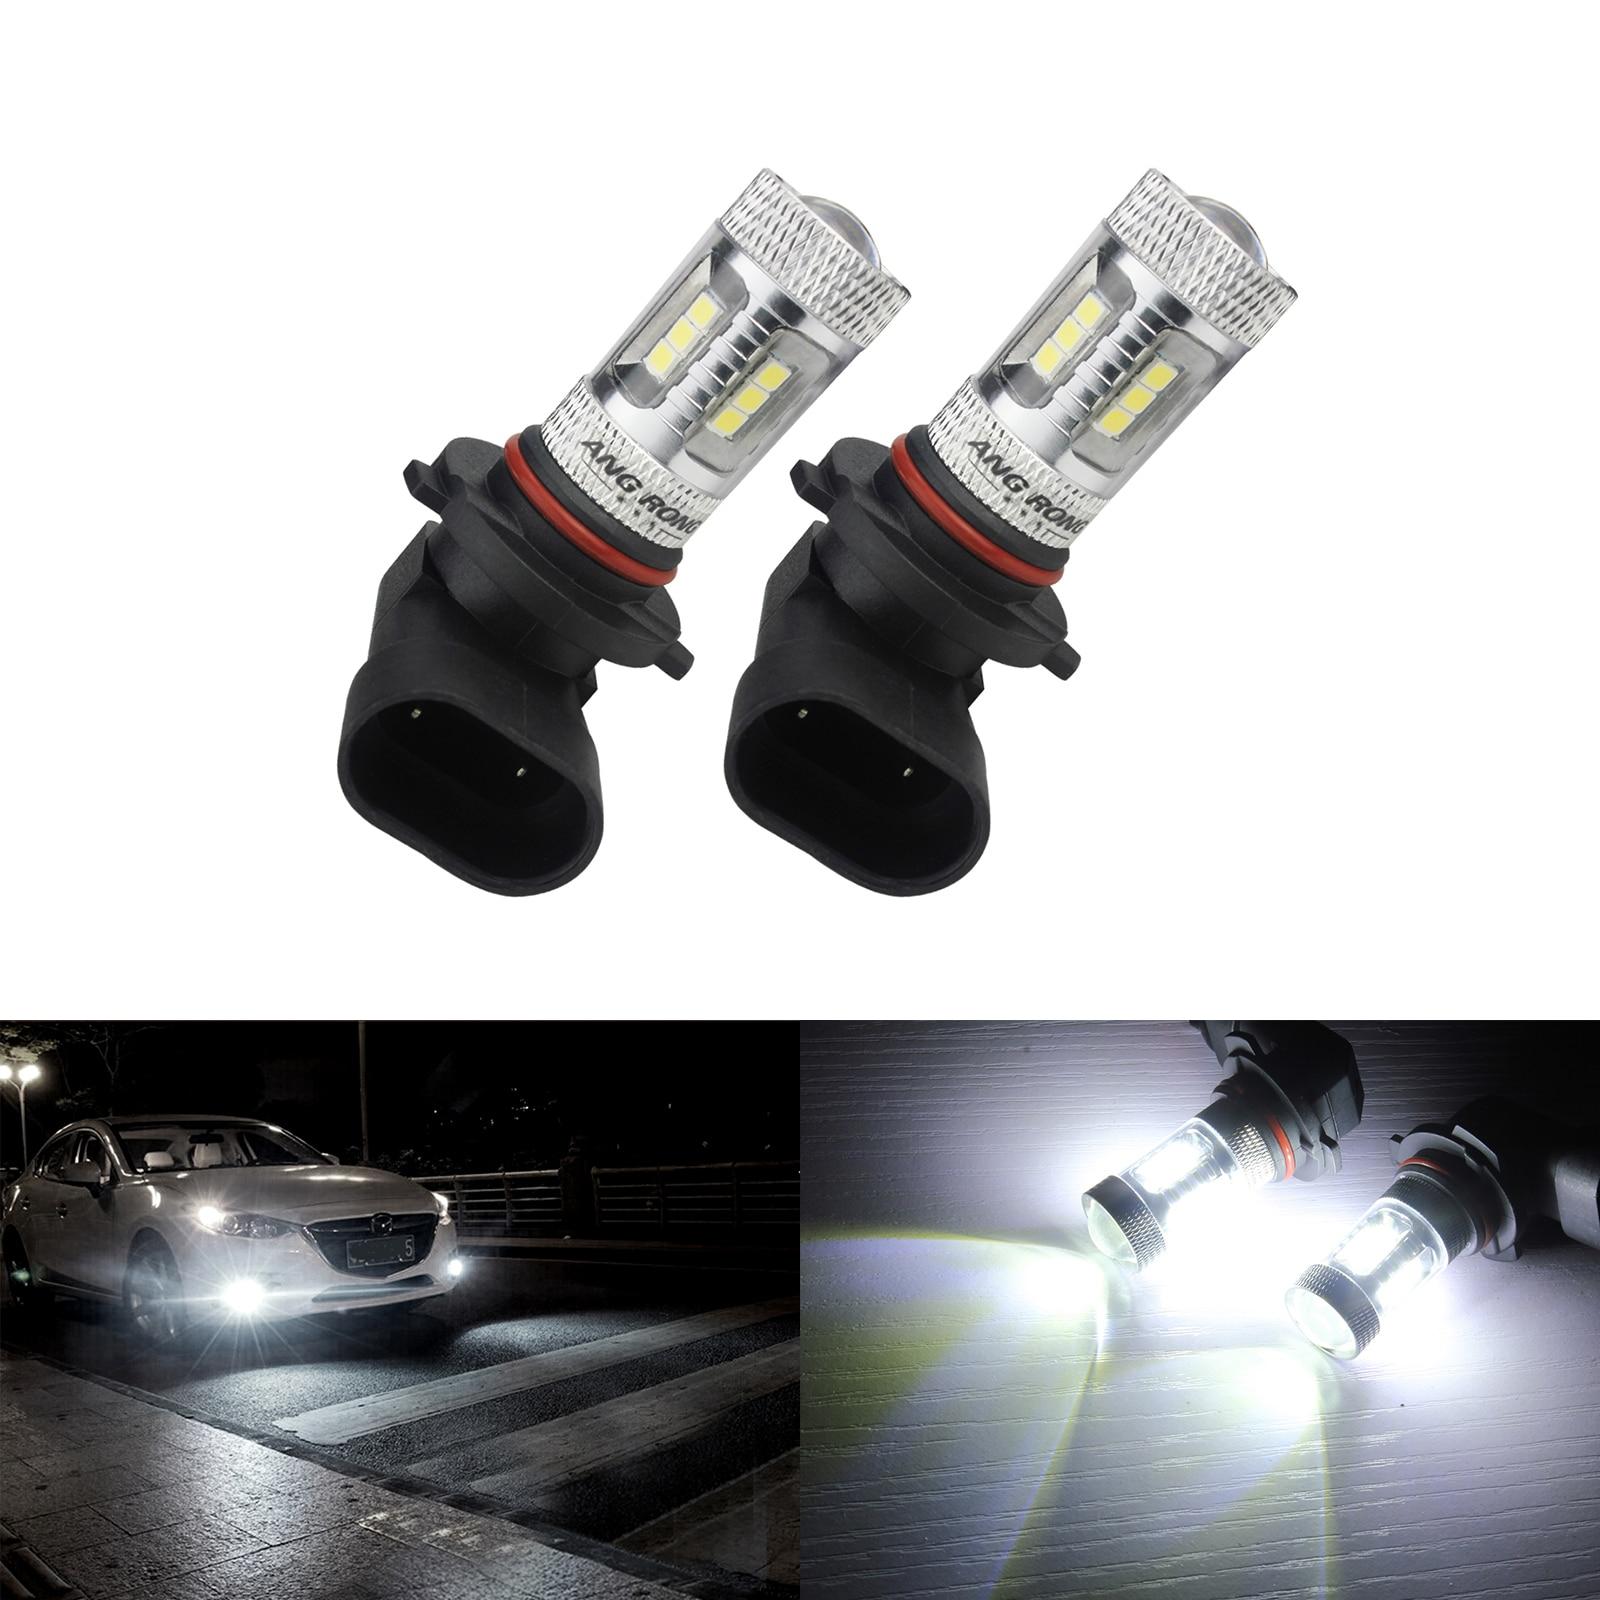 ANGRONG 2x HB3 9005 H10 bombilla LED de circulación diurna niebla luz de conducción xenón blanco